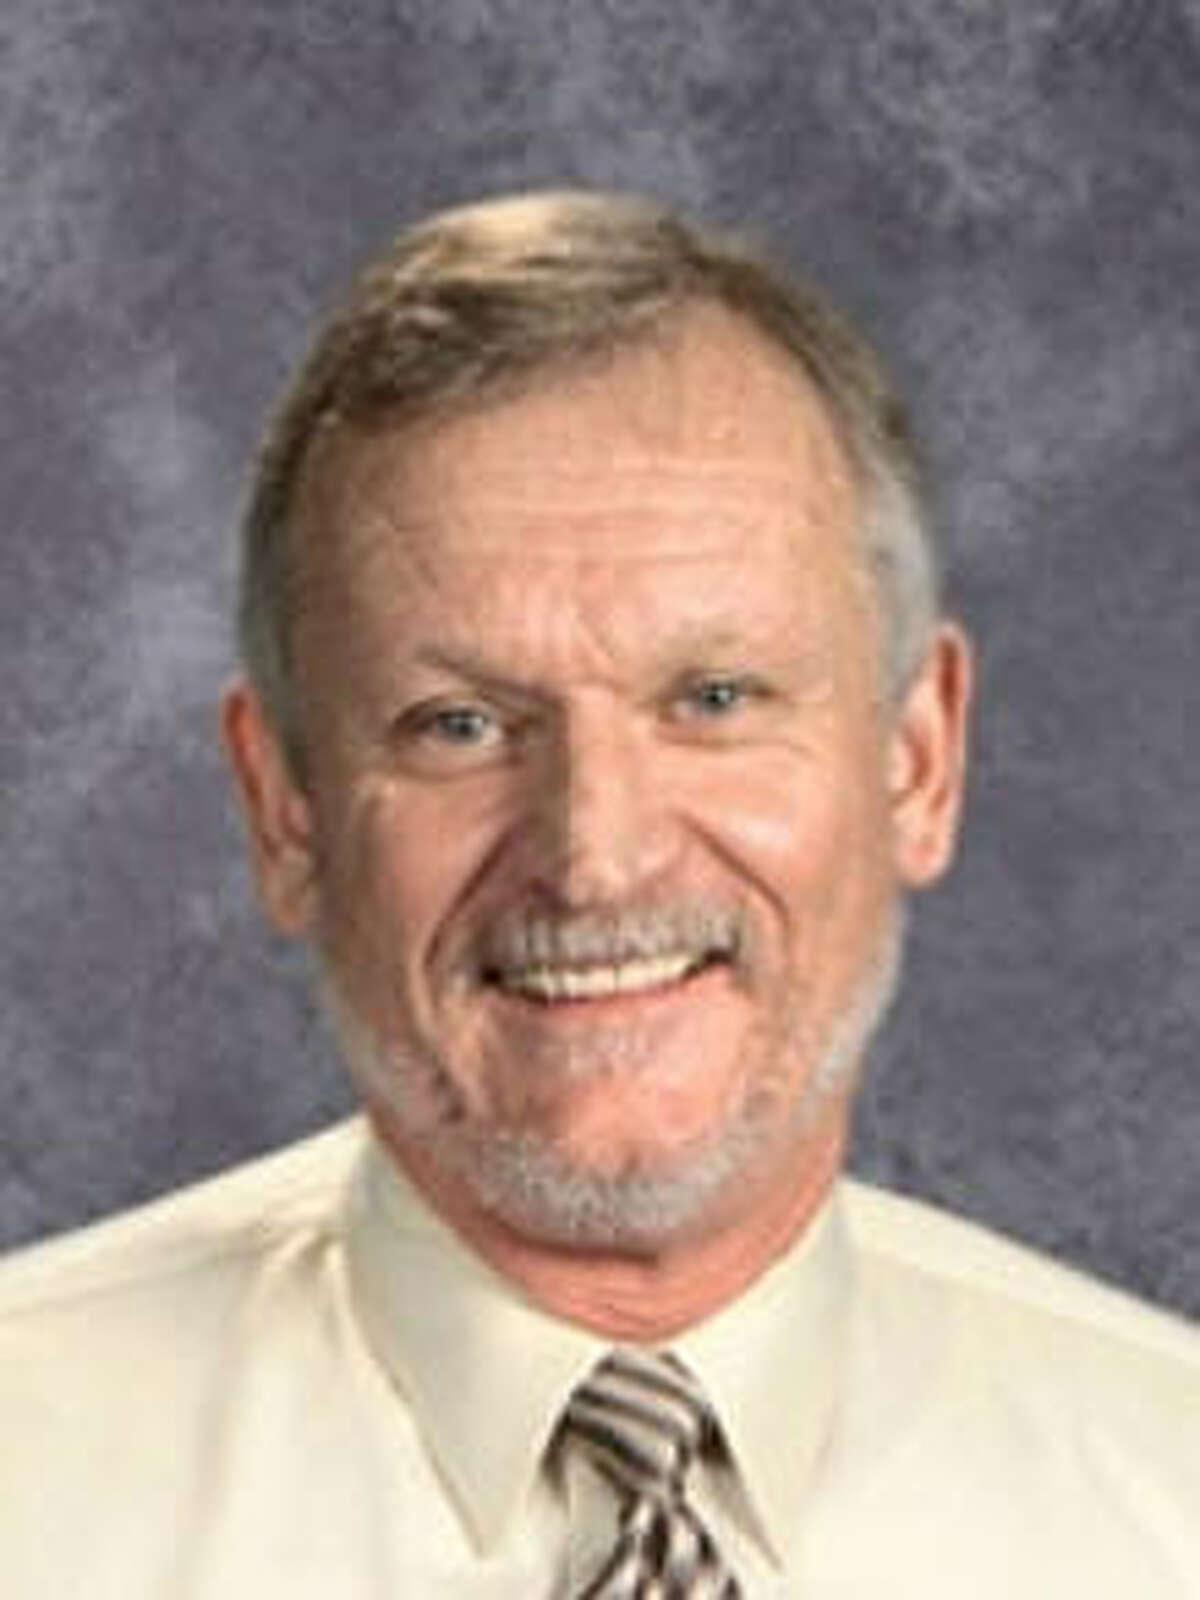 41. Langham Creek High School Principal:David Hughes Salary:$137,080.00 School district:Cypress-Fairbanks ISD